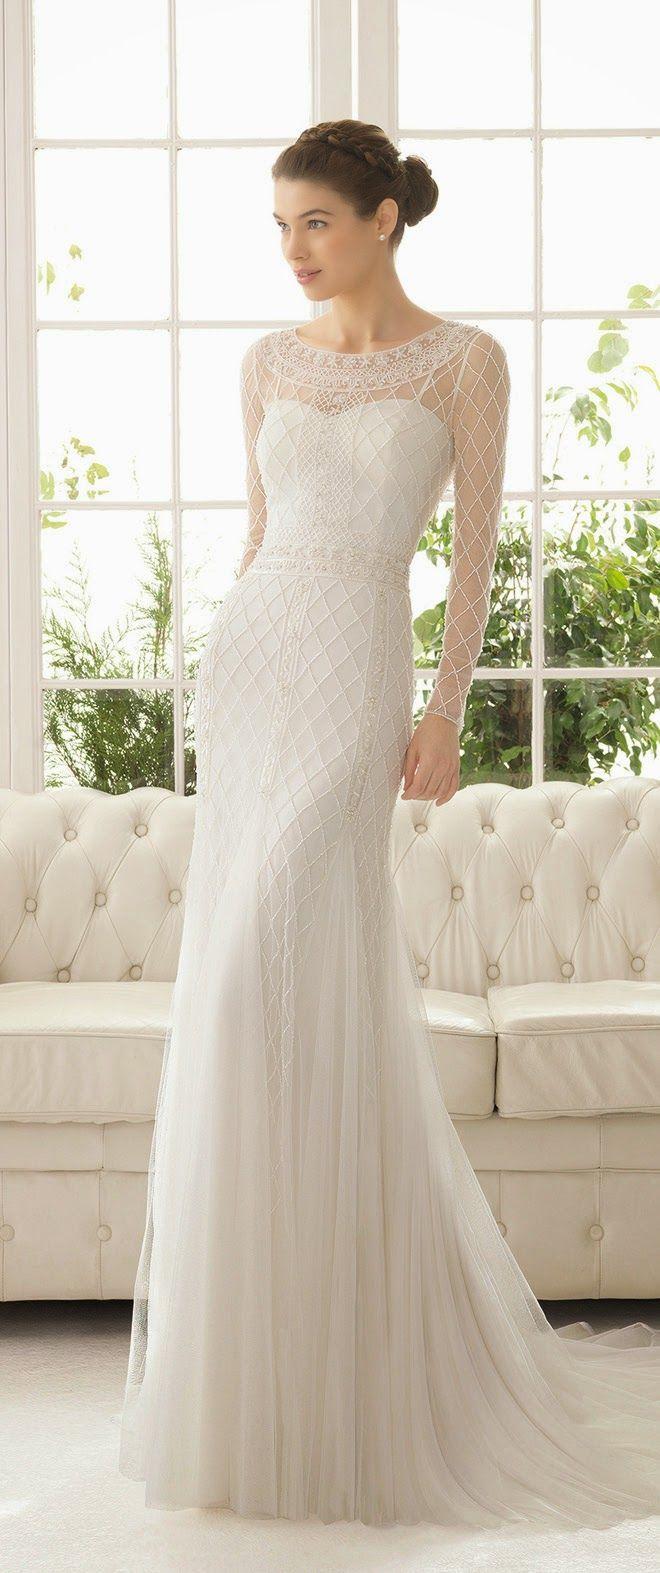 Aire barcelona wedding dresses  Aire Barcelona  Bridal Collection  Wedding Dresses  Pinterest